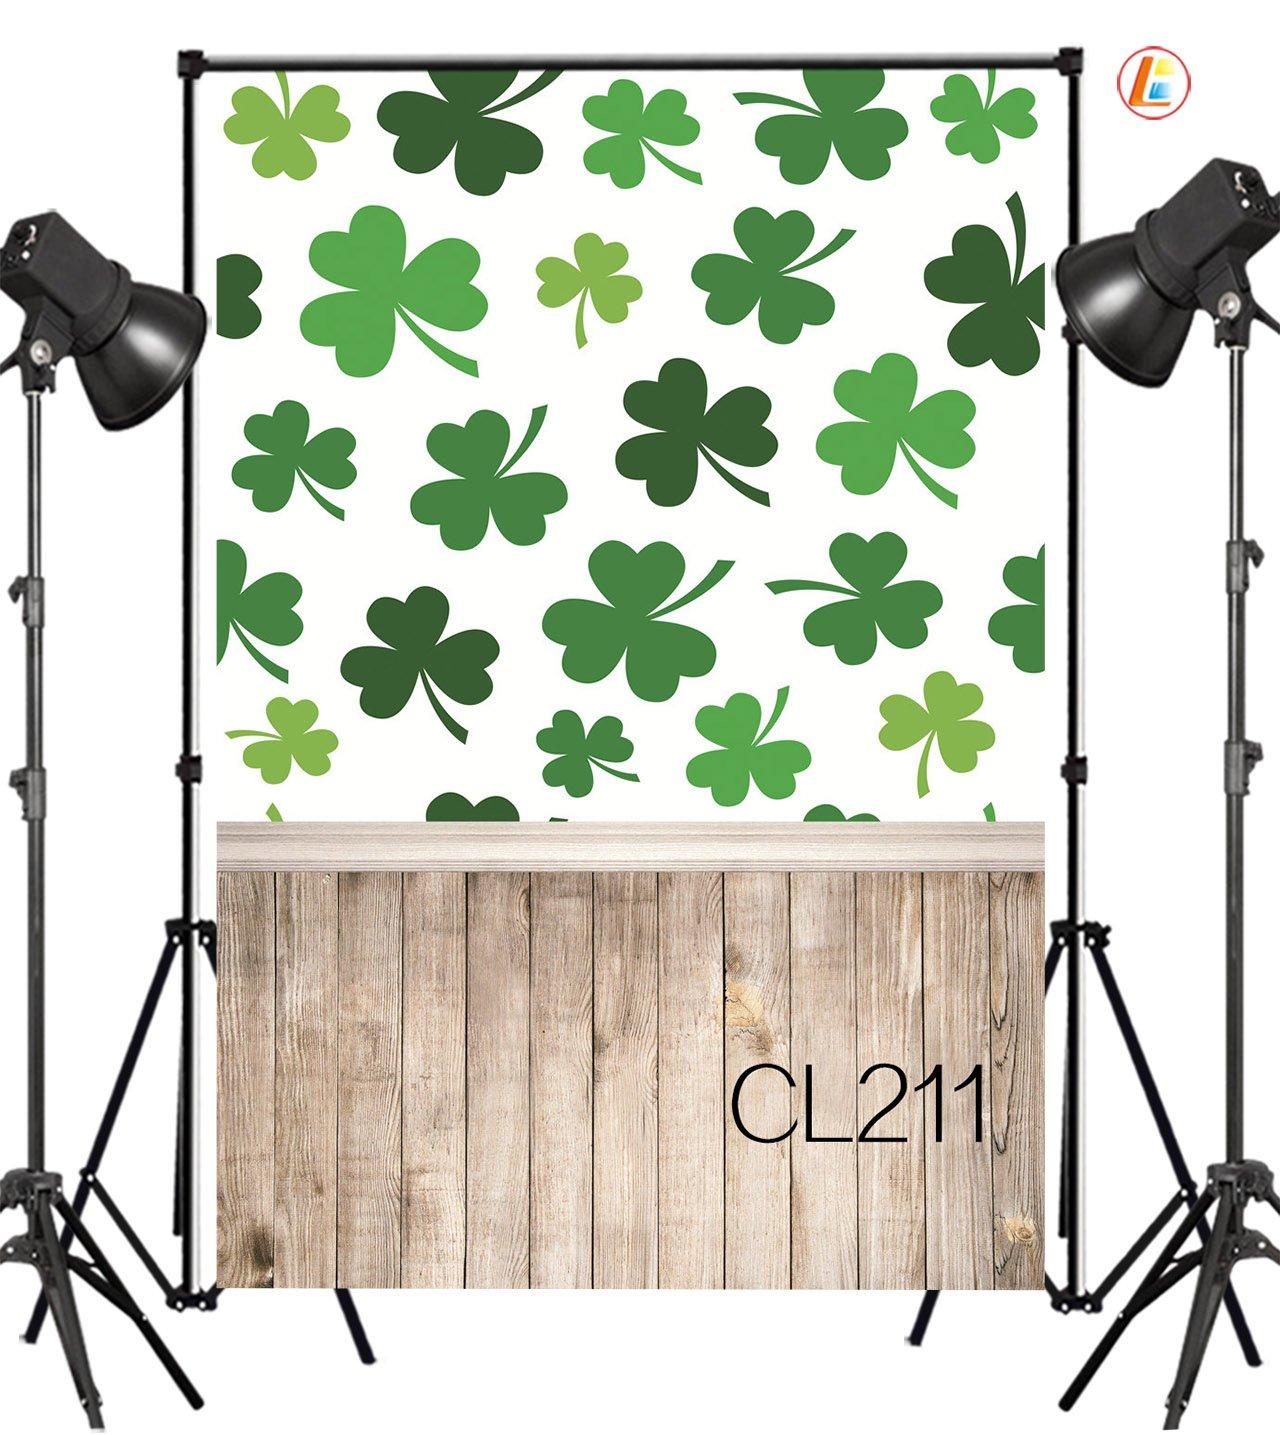 LB 5x7ft Happy Saint Patrick's Day Vinyl Photography Backdrop Customized Photo Background Studio Prop CL211